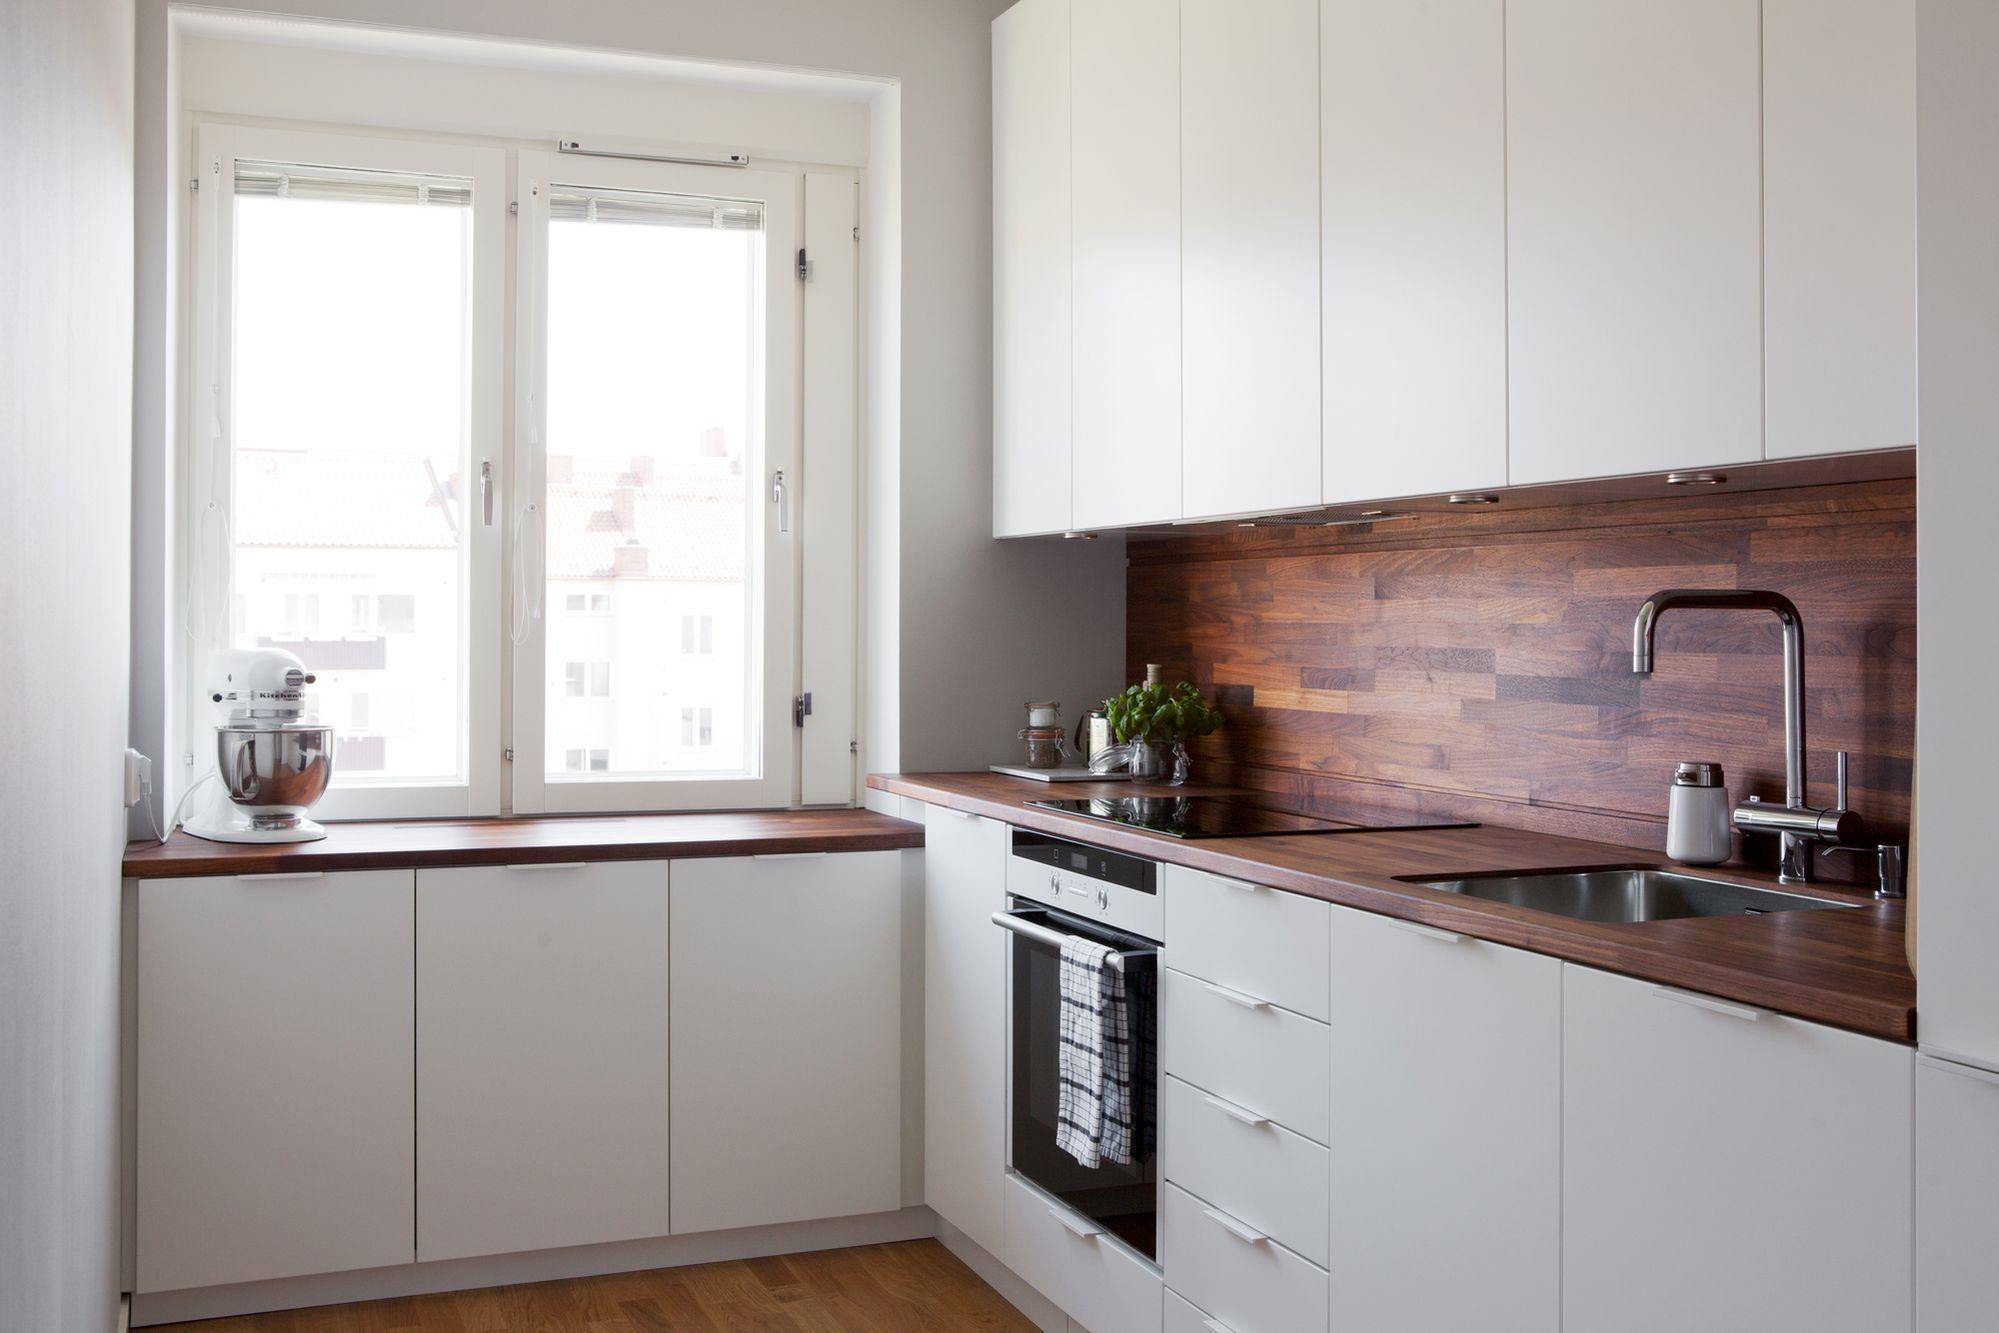 Cocina blanca con revestimiento de madera oscura blog for Cocina blanca y madera moderna